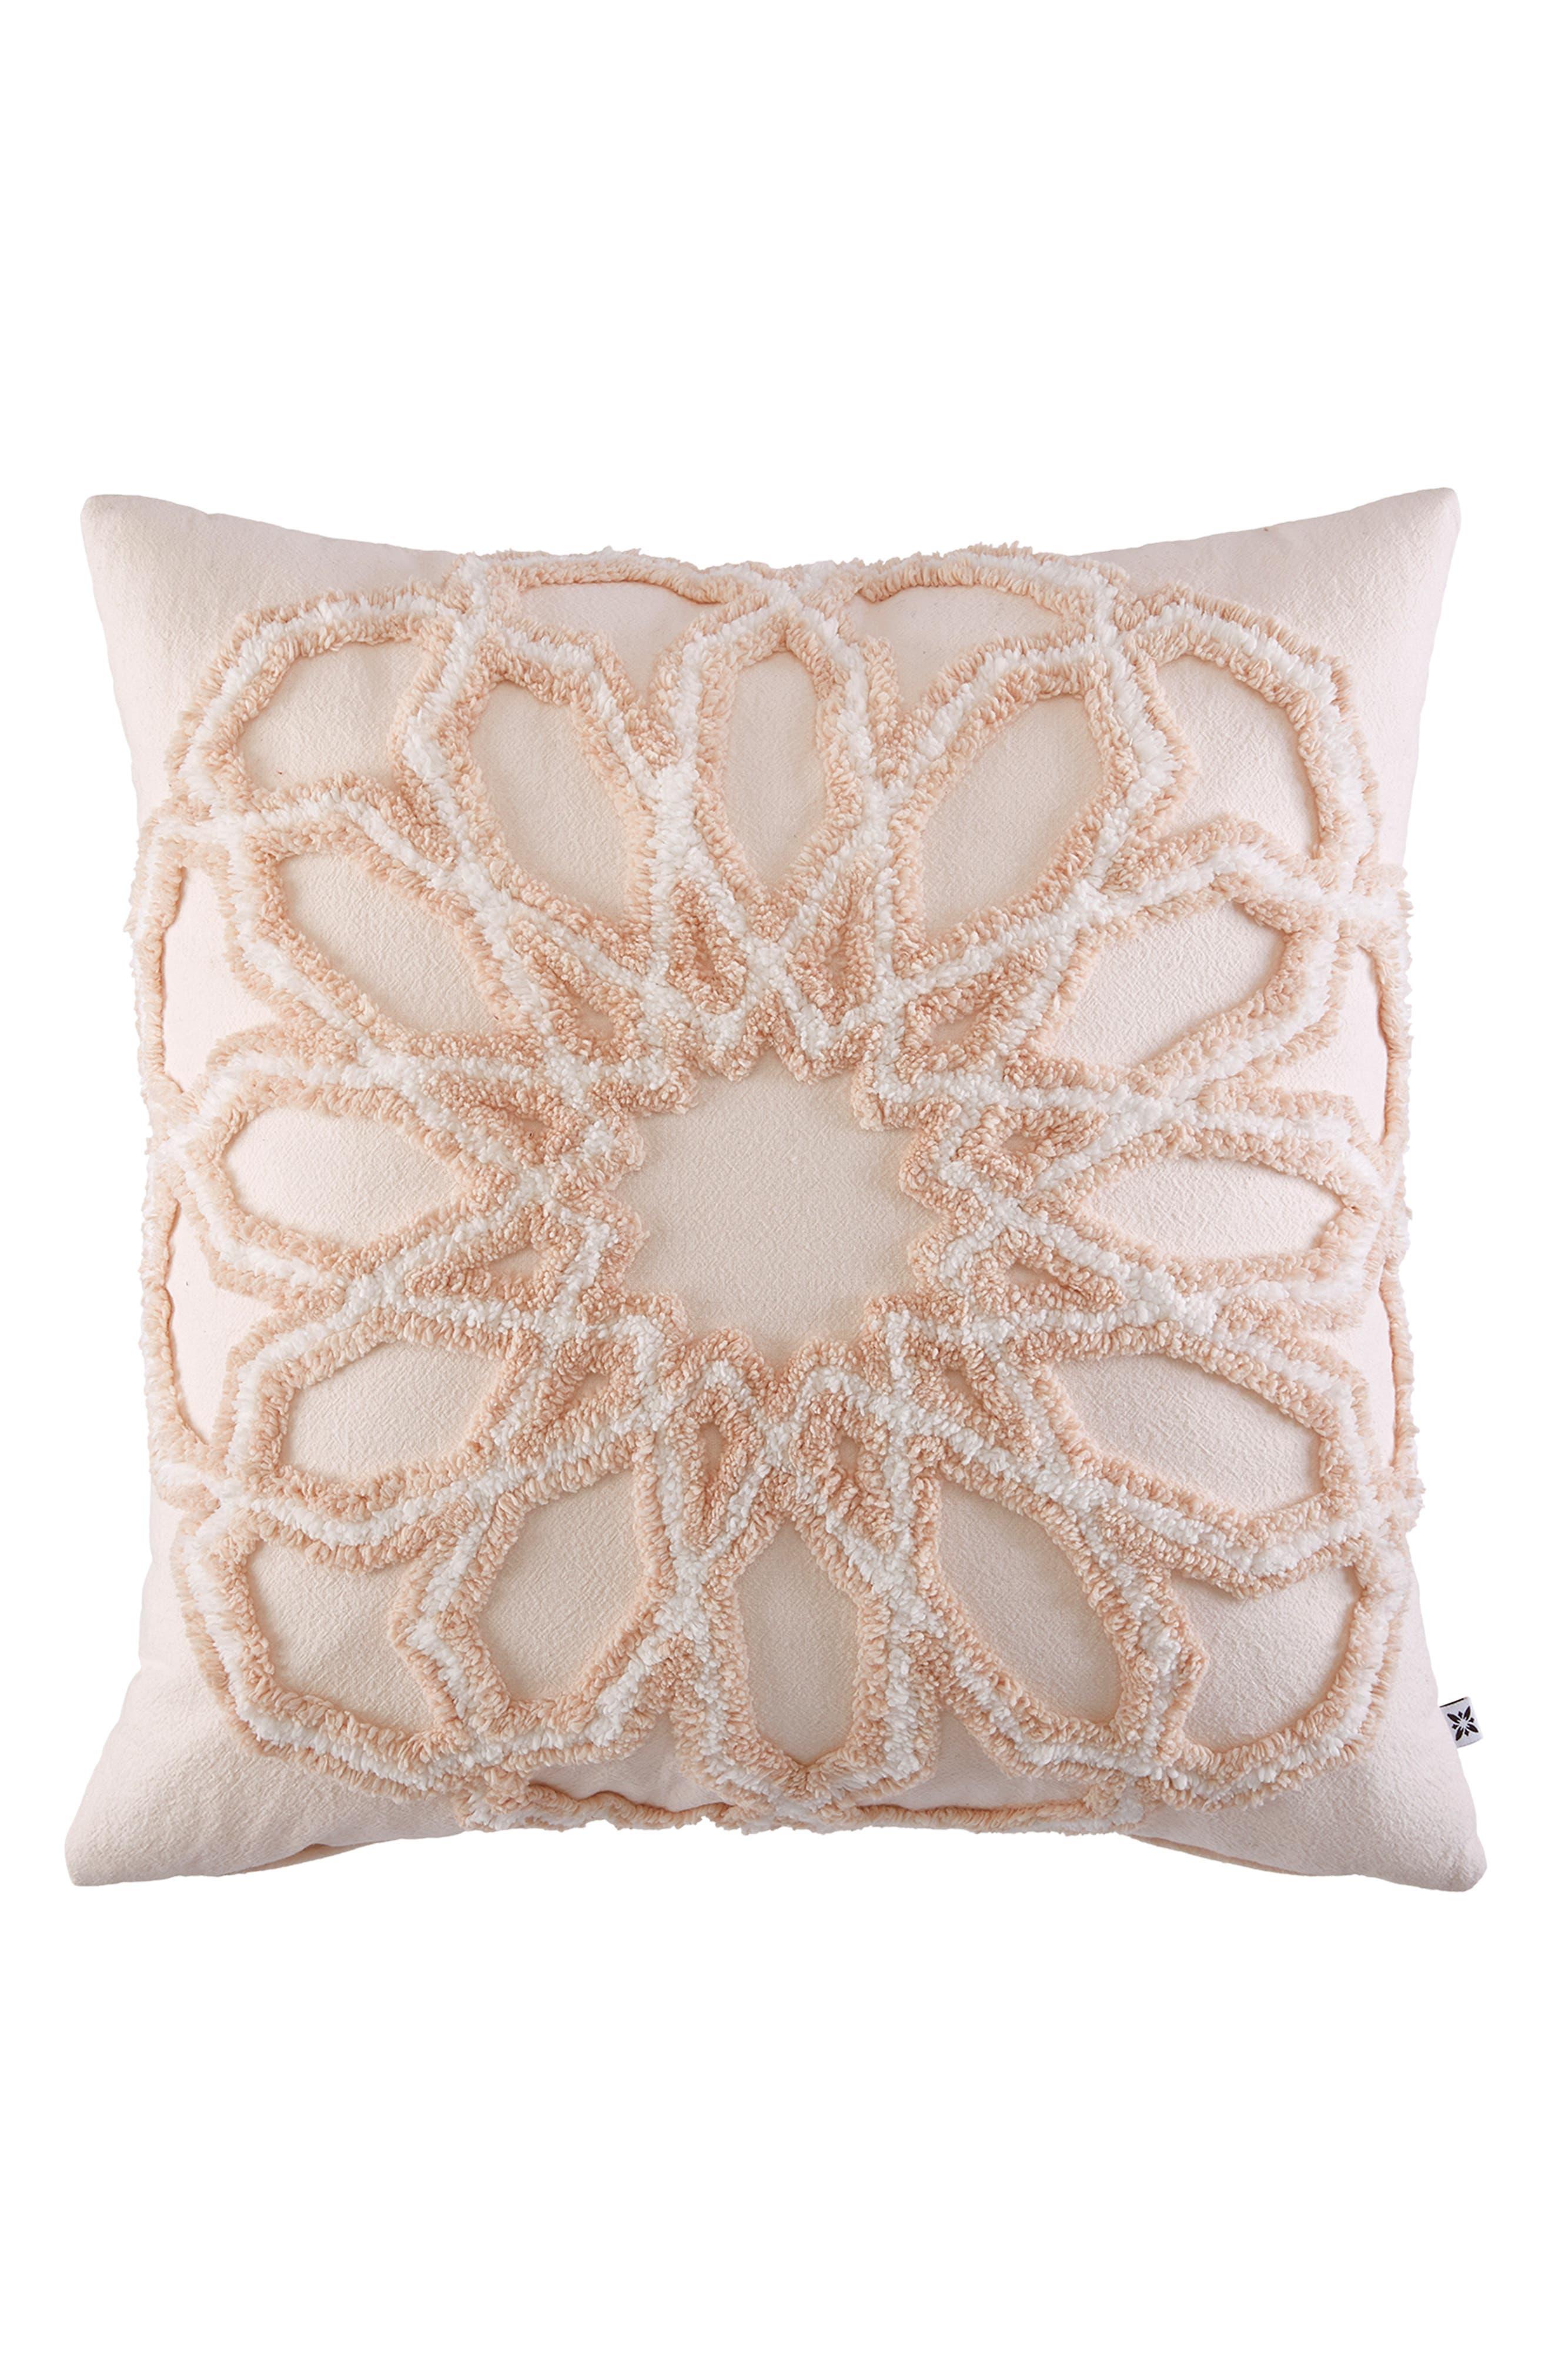 Marrakesh Tufted Accent Pillow,                             Main thumbnail 1, color,                             650